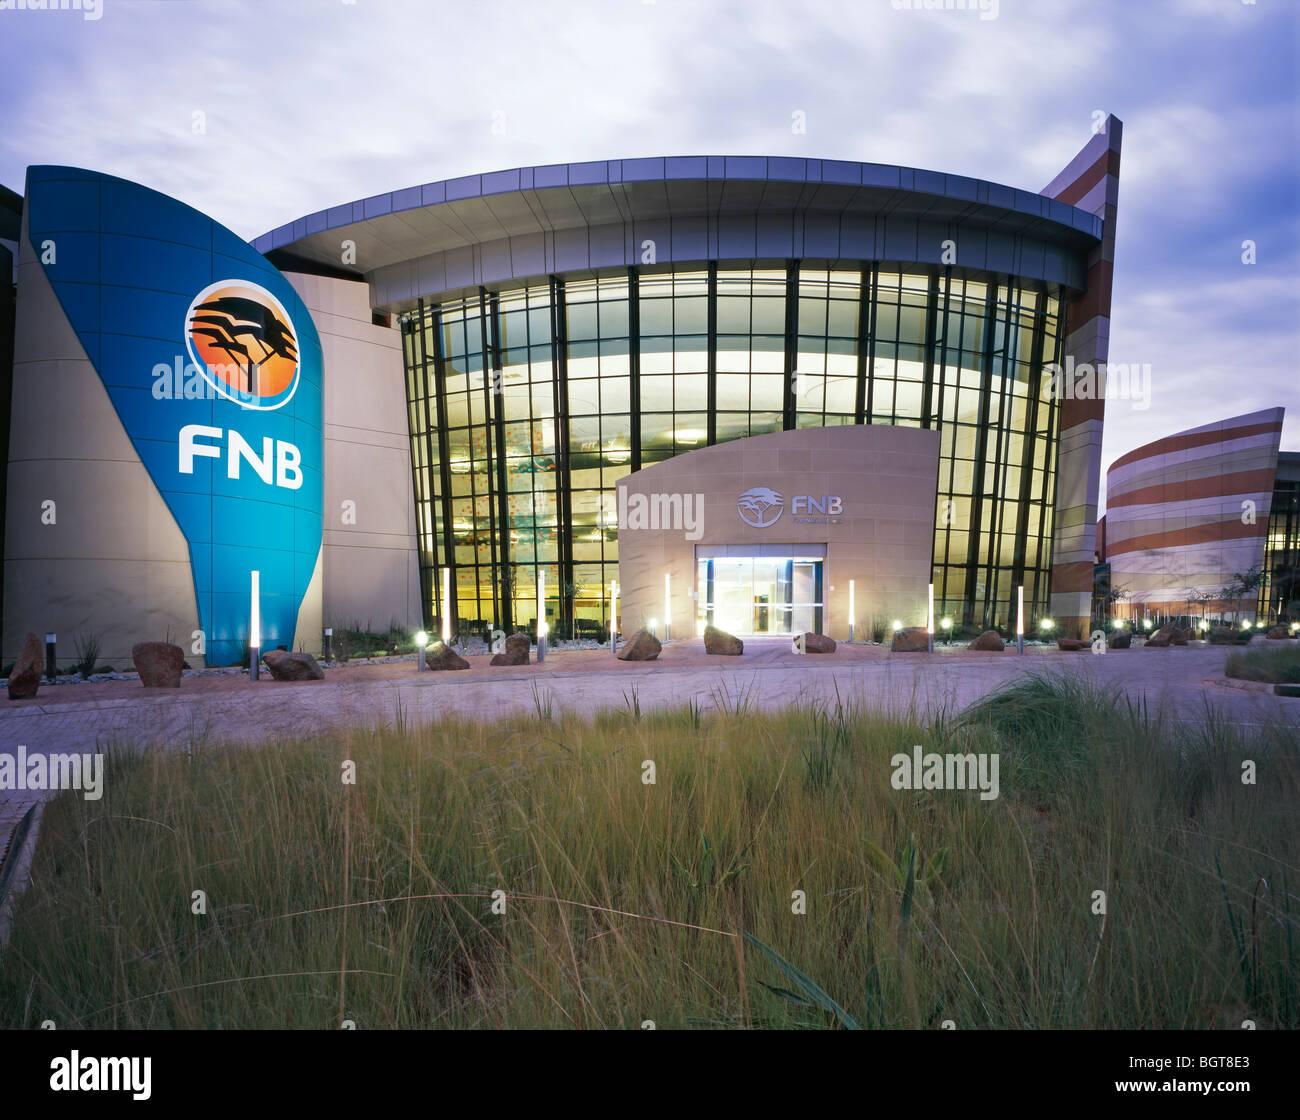 [Imagem: fnb-wesbank-n-1-enterprise-rd-fairlands-...bgt8e3.jpg]